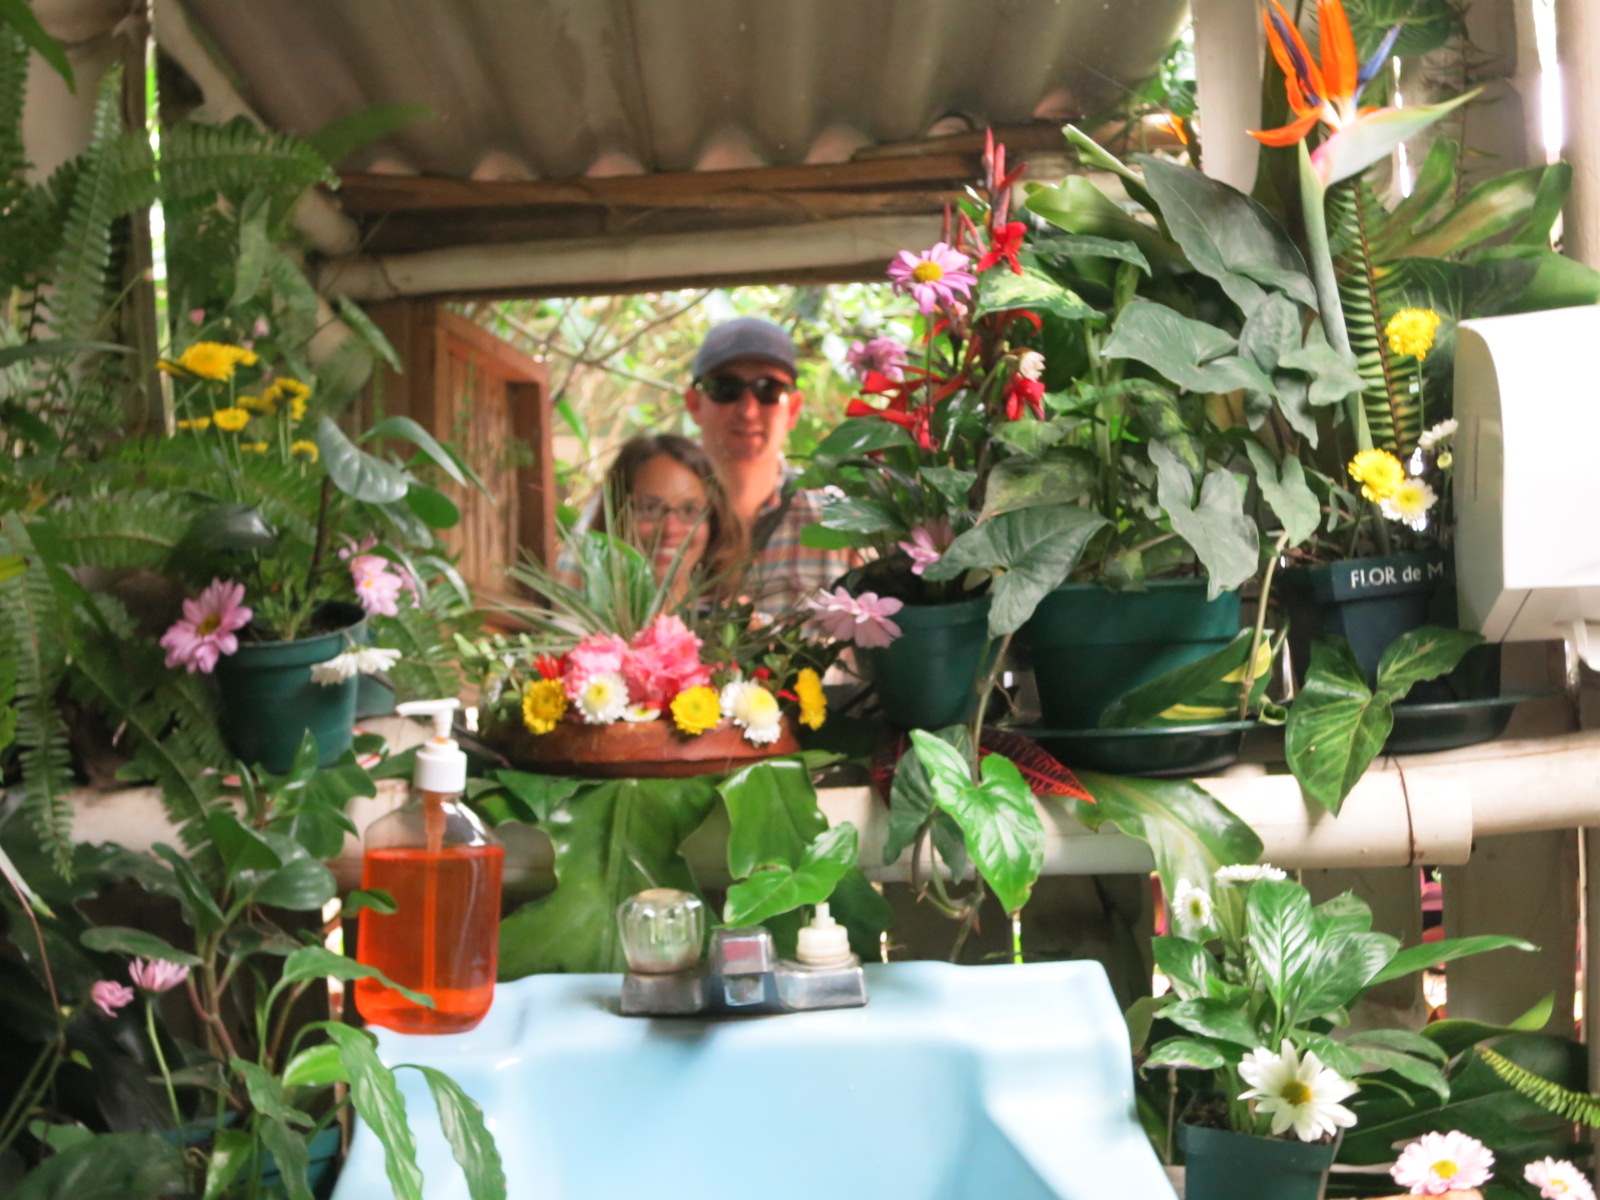 I love a nice bathroom! This one had flowers everywhere!